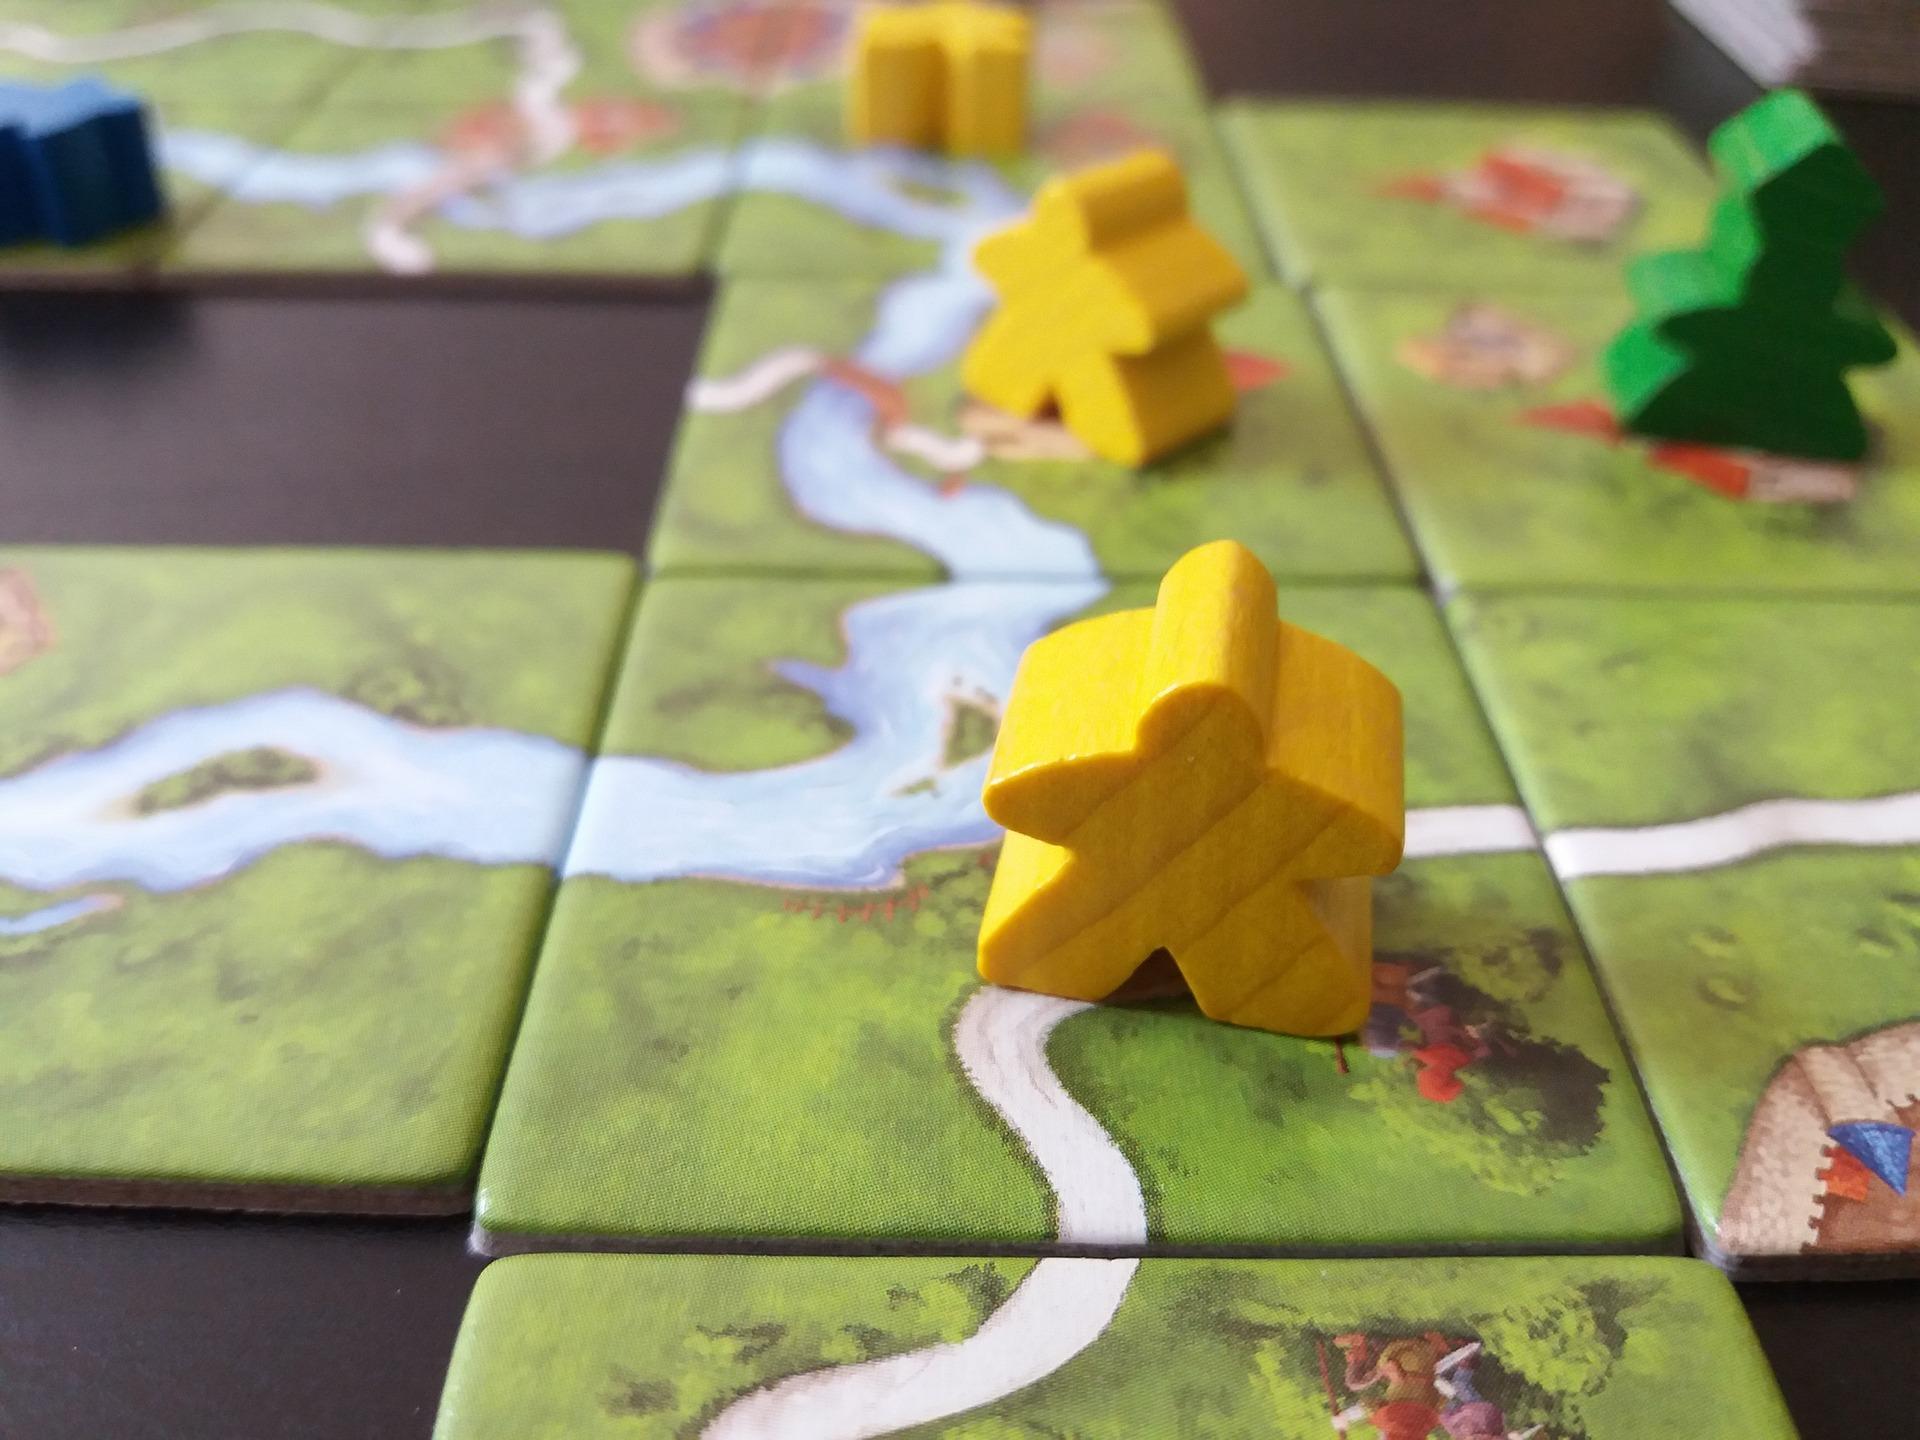 board-game-2237460_1920